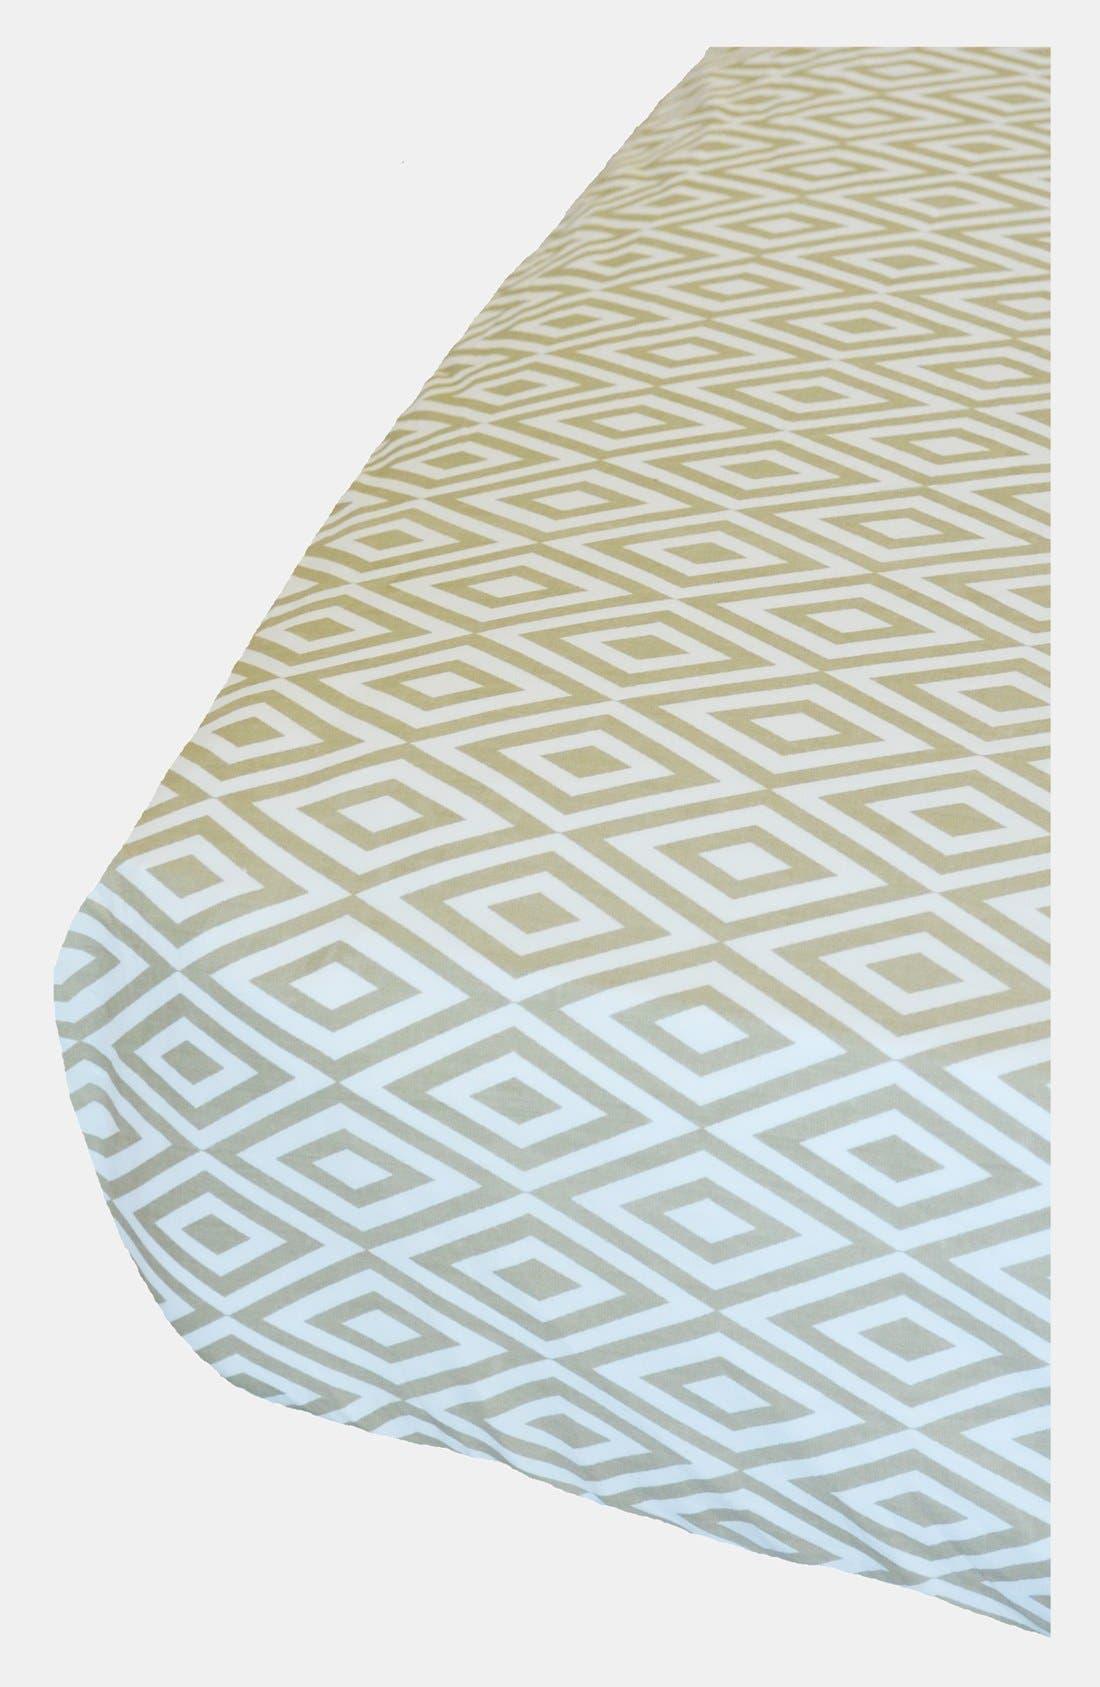 Alternate Image 1 Selected - Oliver B 'Diamond' Crib Sheet